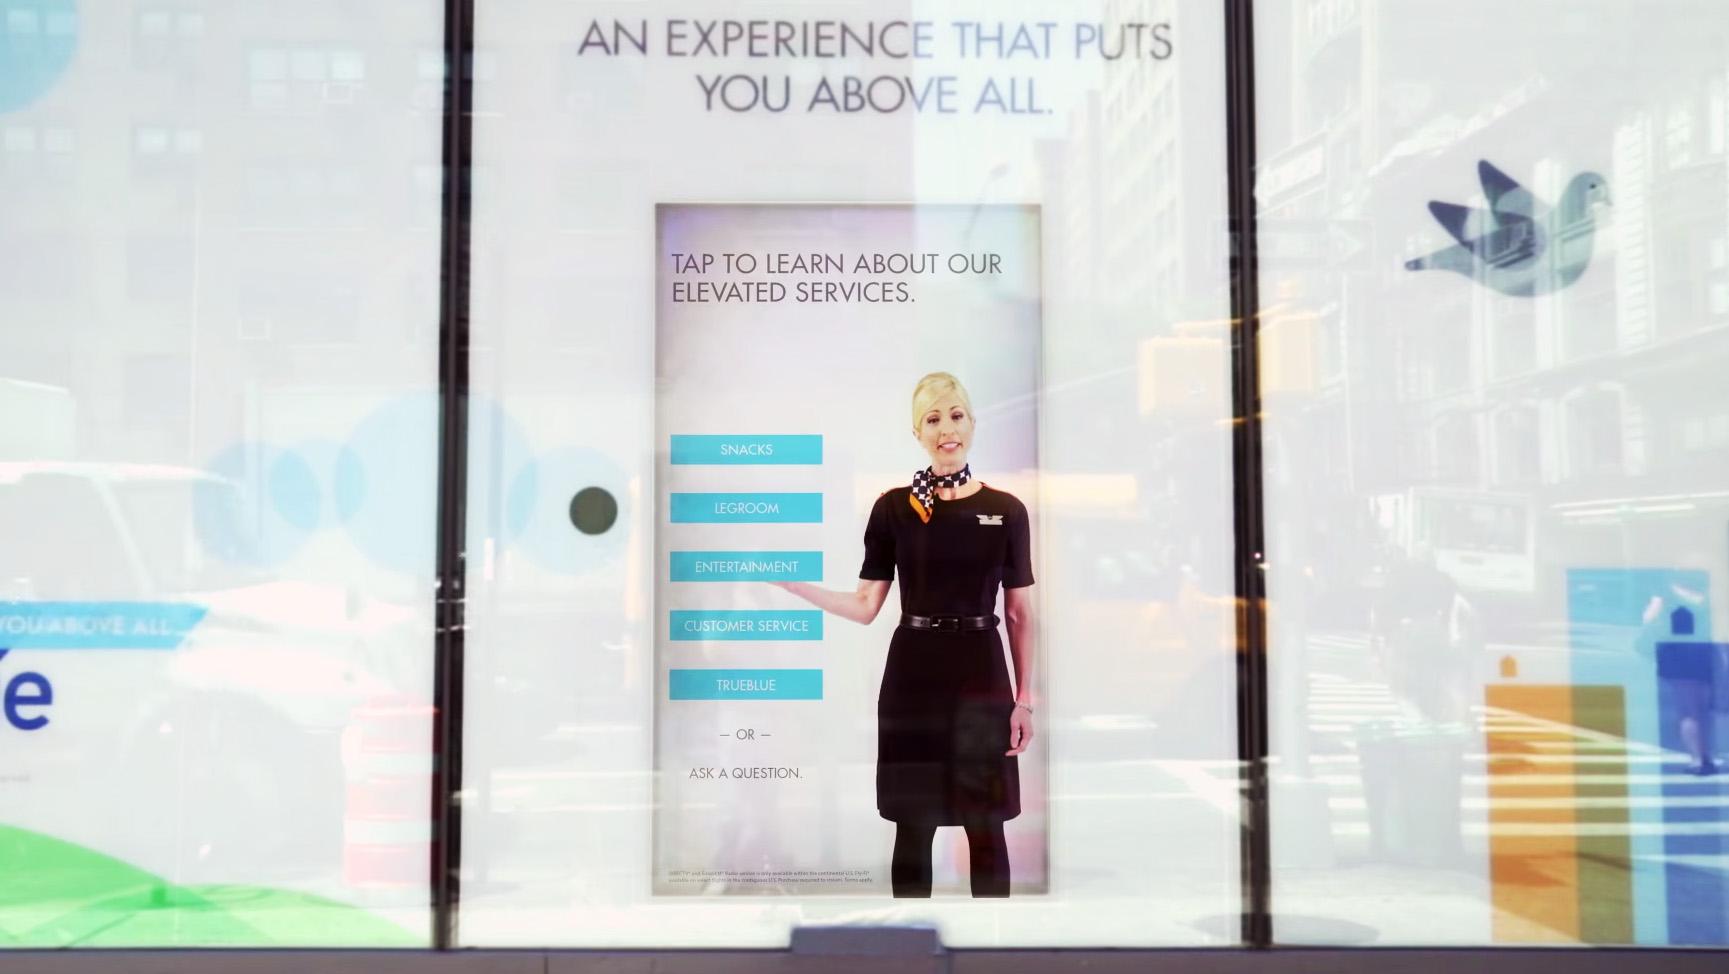 Jetblue marketing experience